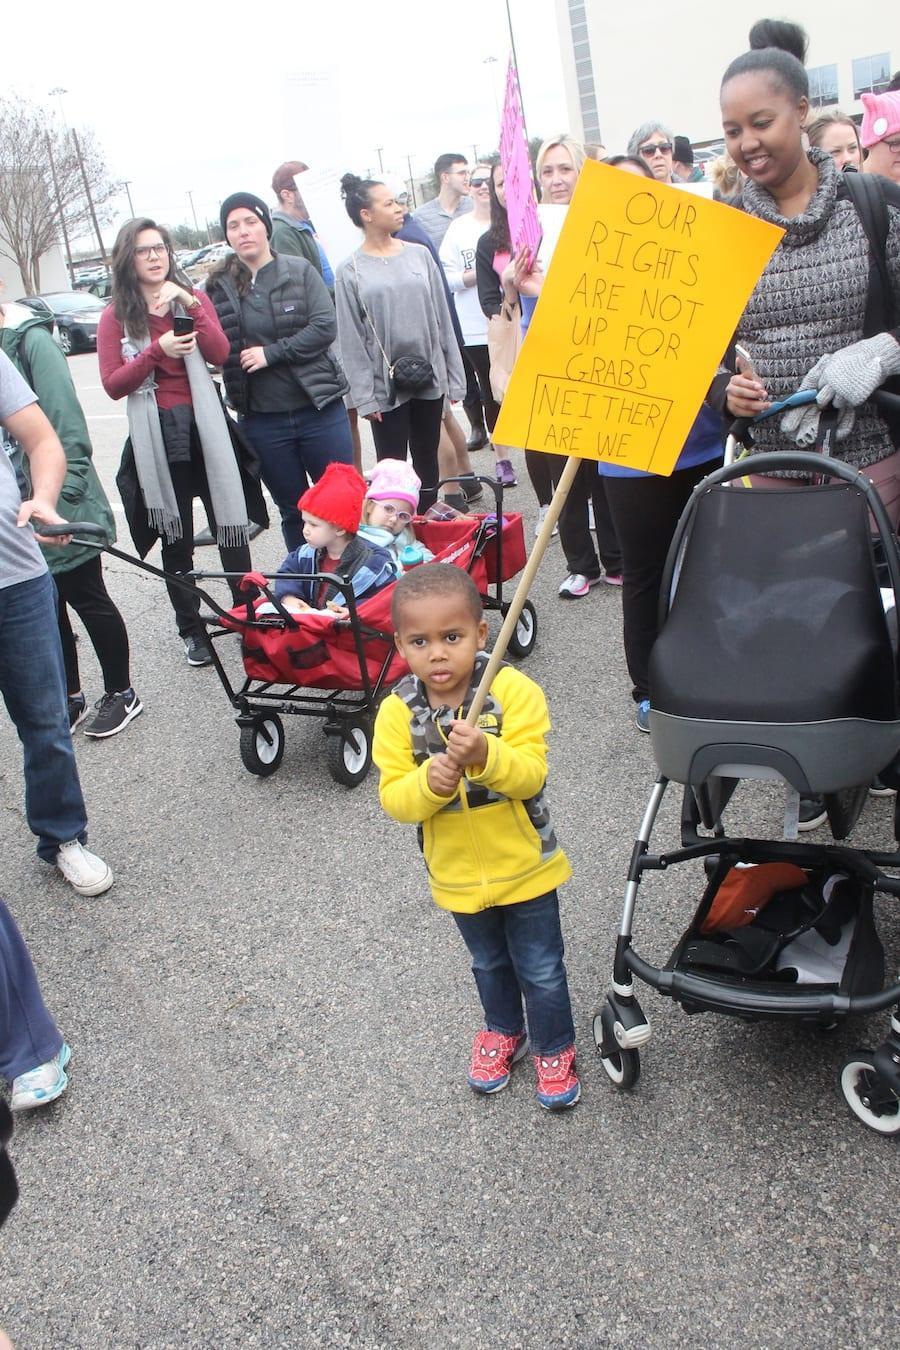 UPDATE: Two protests in Dallas call for Trump's impeachment